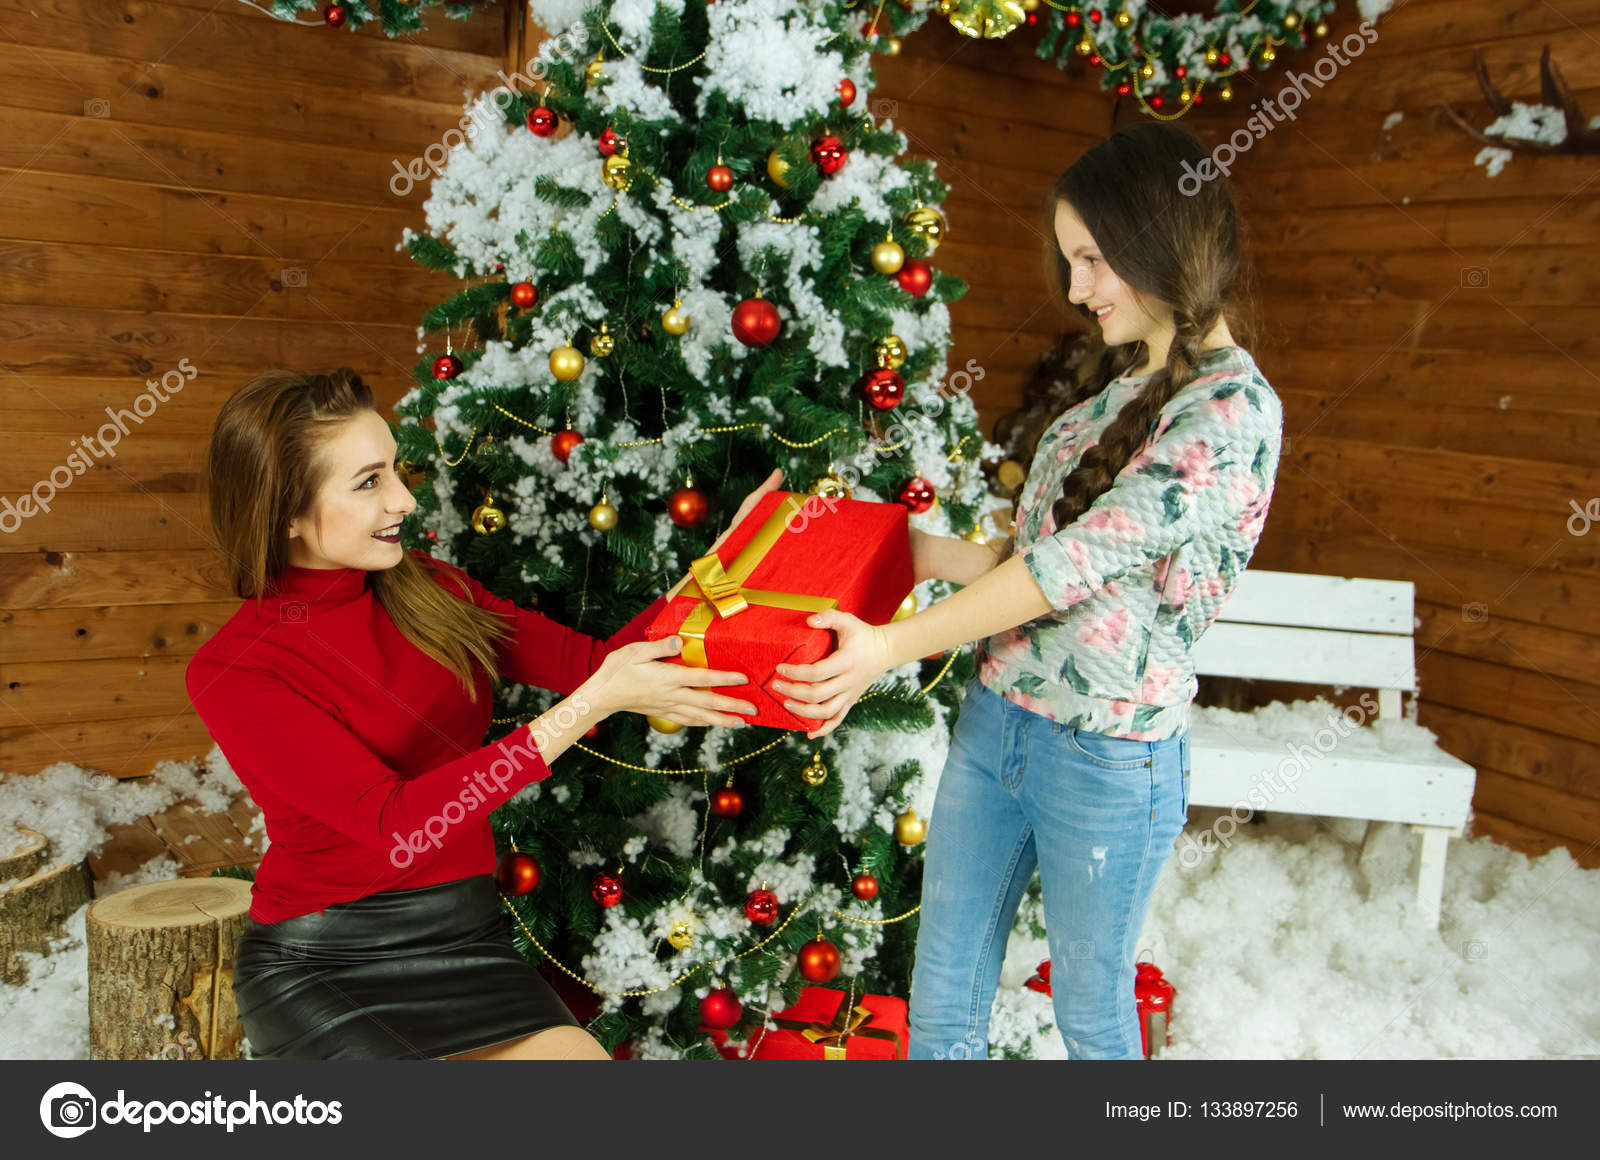 Family Christmas Gift Giving.Gift Giving In The Family Stock Photo C Irina1977 133897256